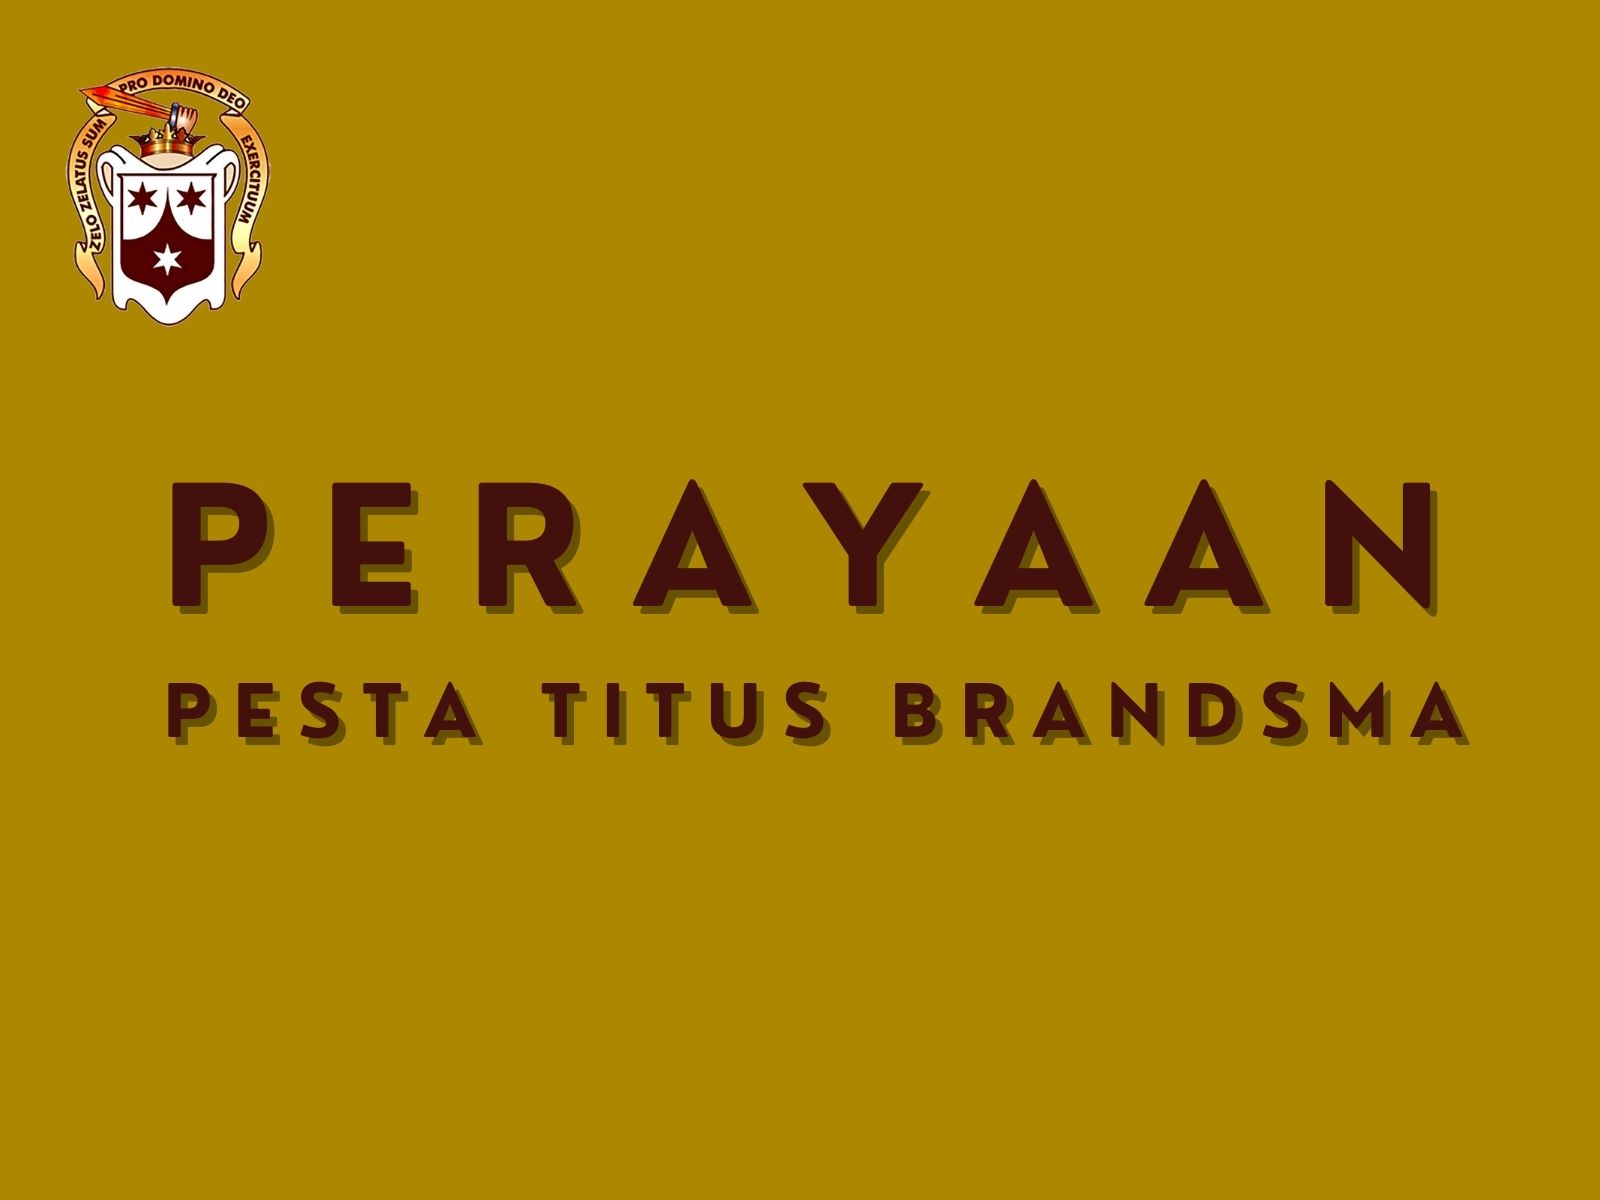 Perayaan Pesta Beato Titus Brandsma